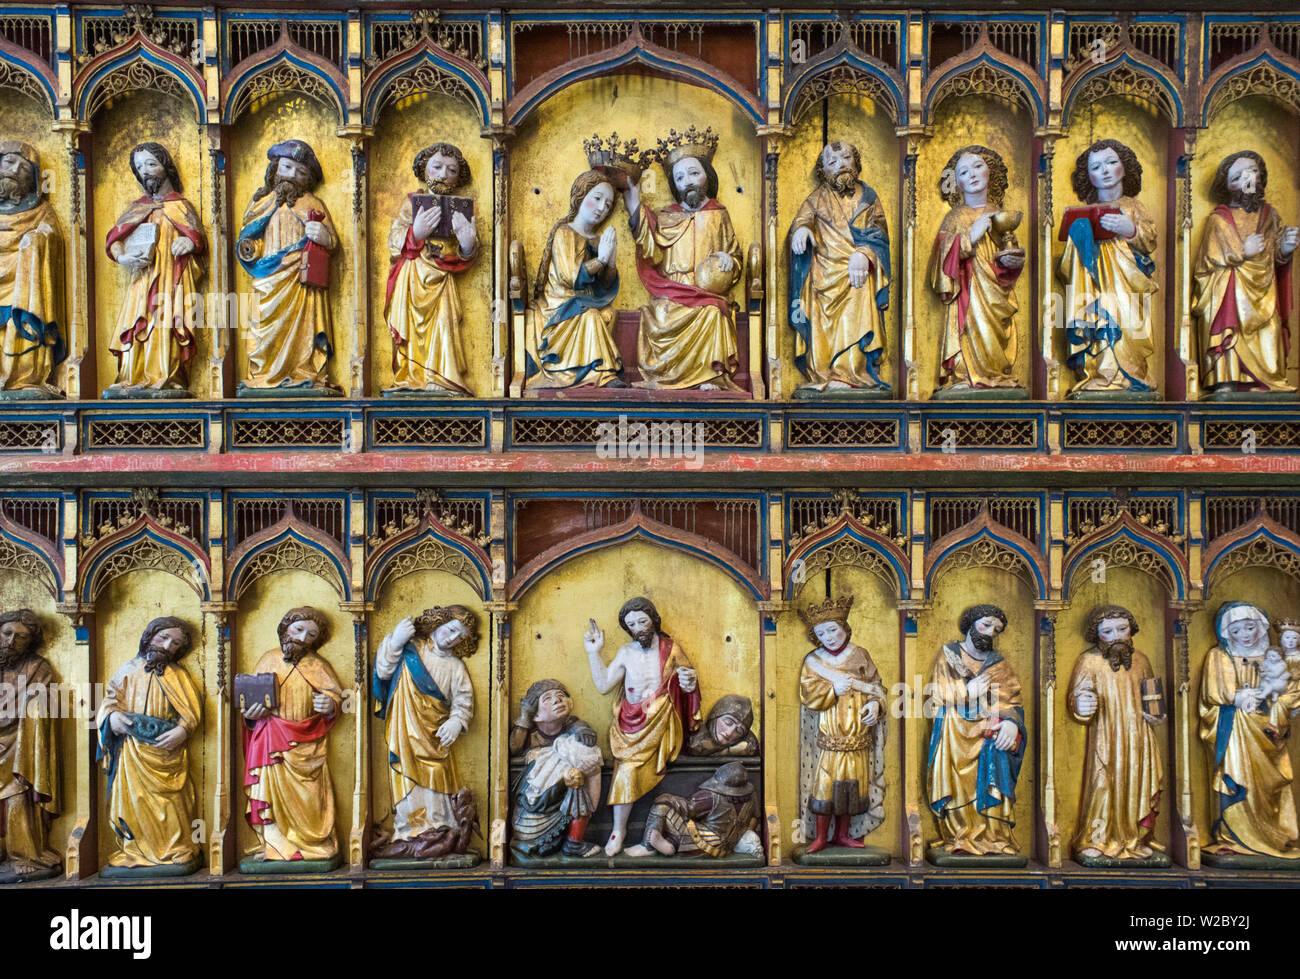 Dinamarca, Zelanda, Copenhague, El Museo Nacional, el cristiano del siglo xiv altar detalle Foto de stock